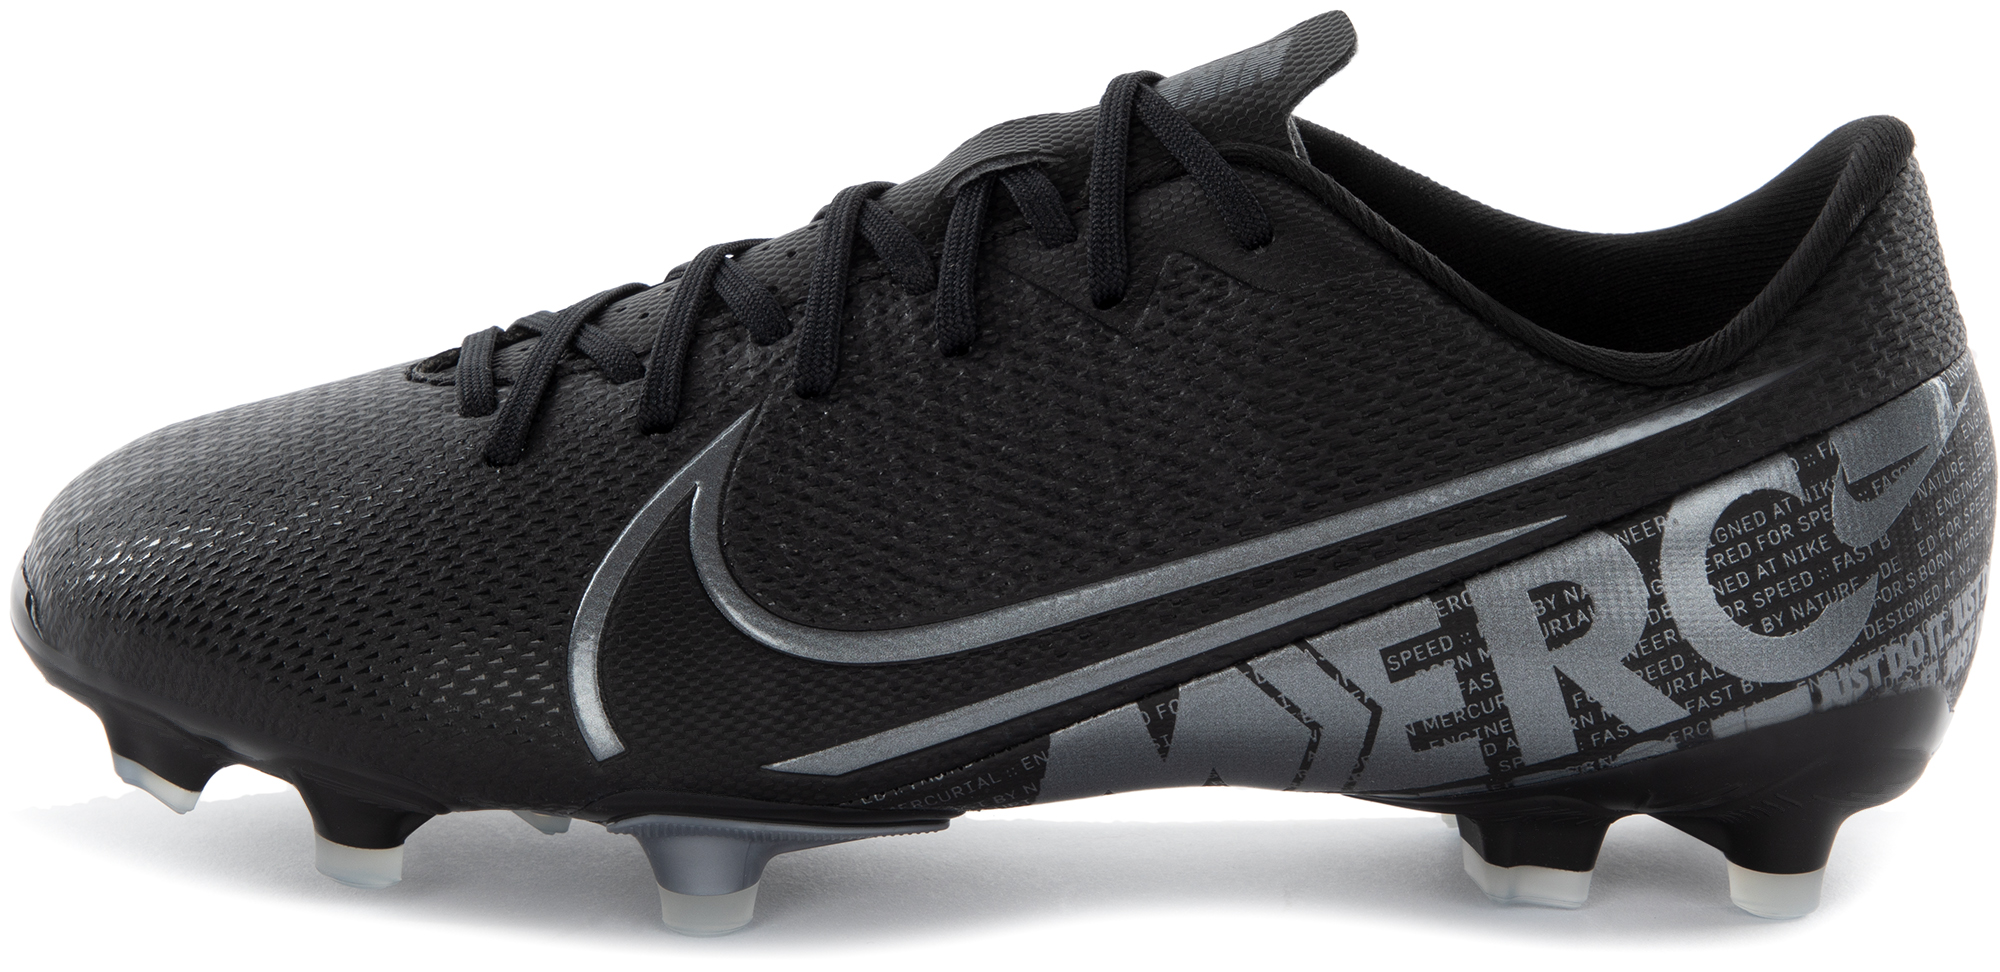 цена Nike Бутсы для мальчиков Nike Jr Vapor 13 Academy FG/MG, размер 37,5 онлайн в 2017 году